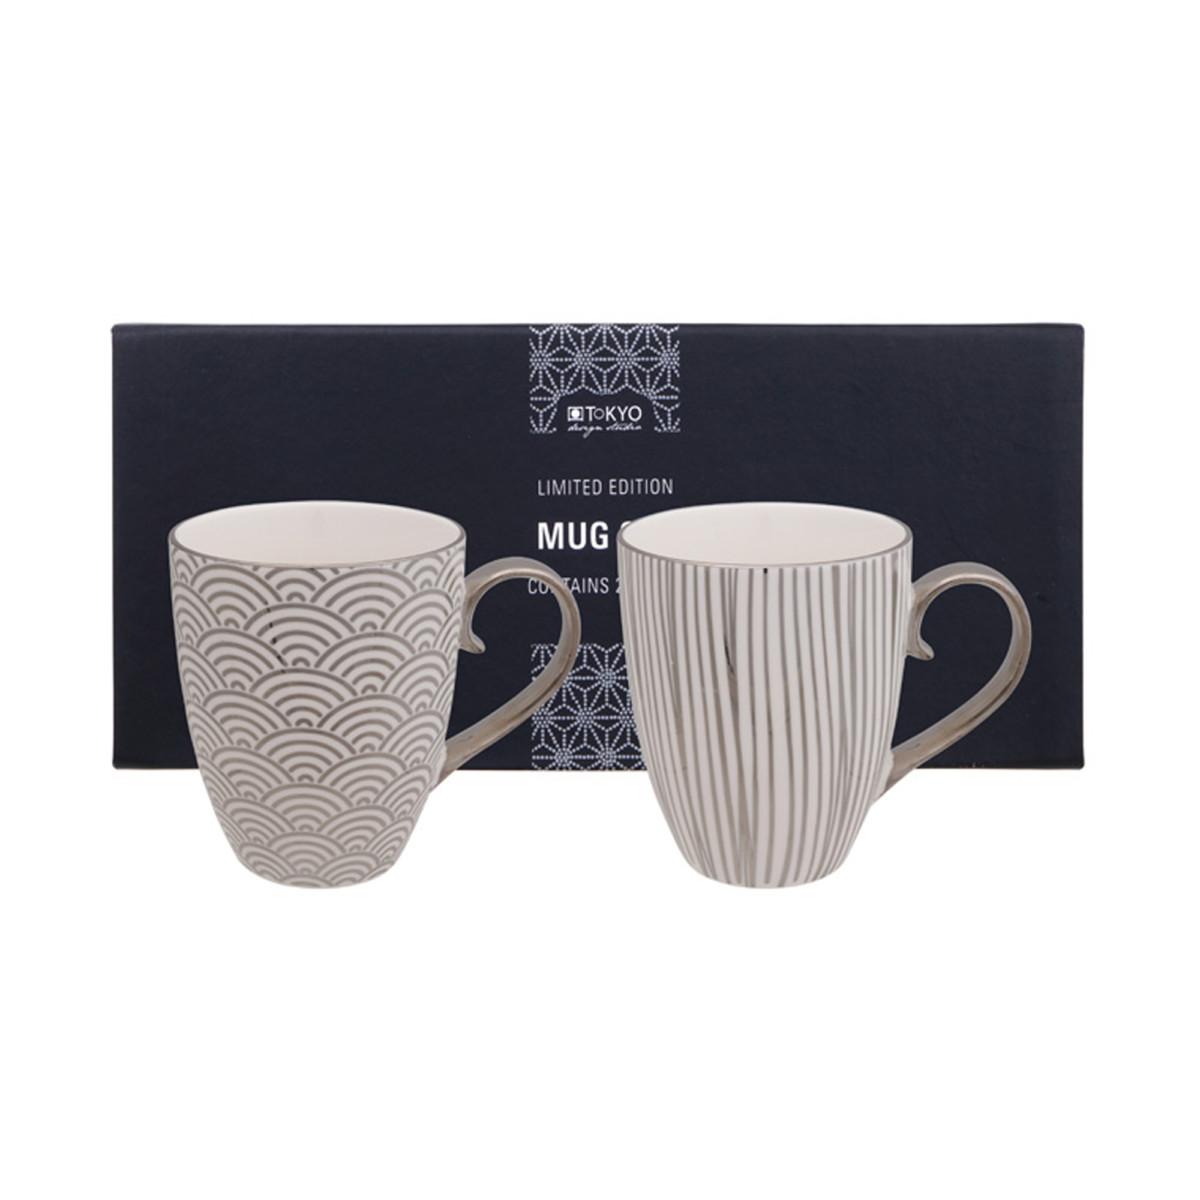 TOKYO DESIGN – LIMITED EDITION – NIPPON PLATINUM MUG SET 2PCS 380ML STAR & LINES